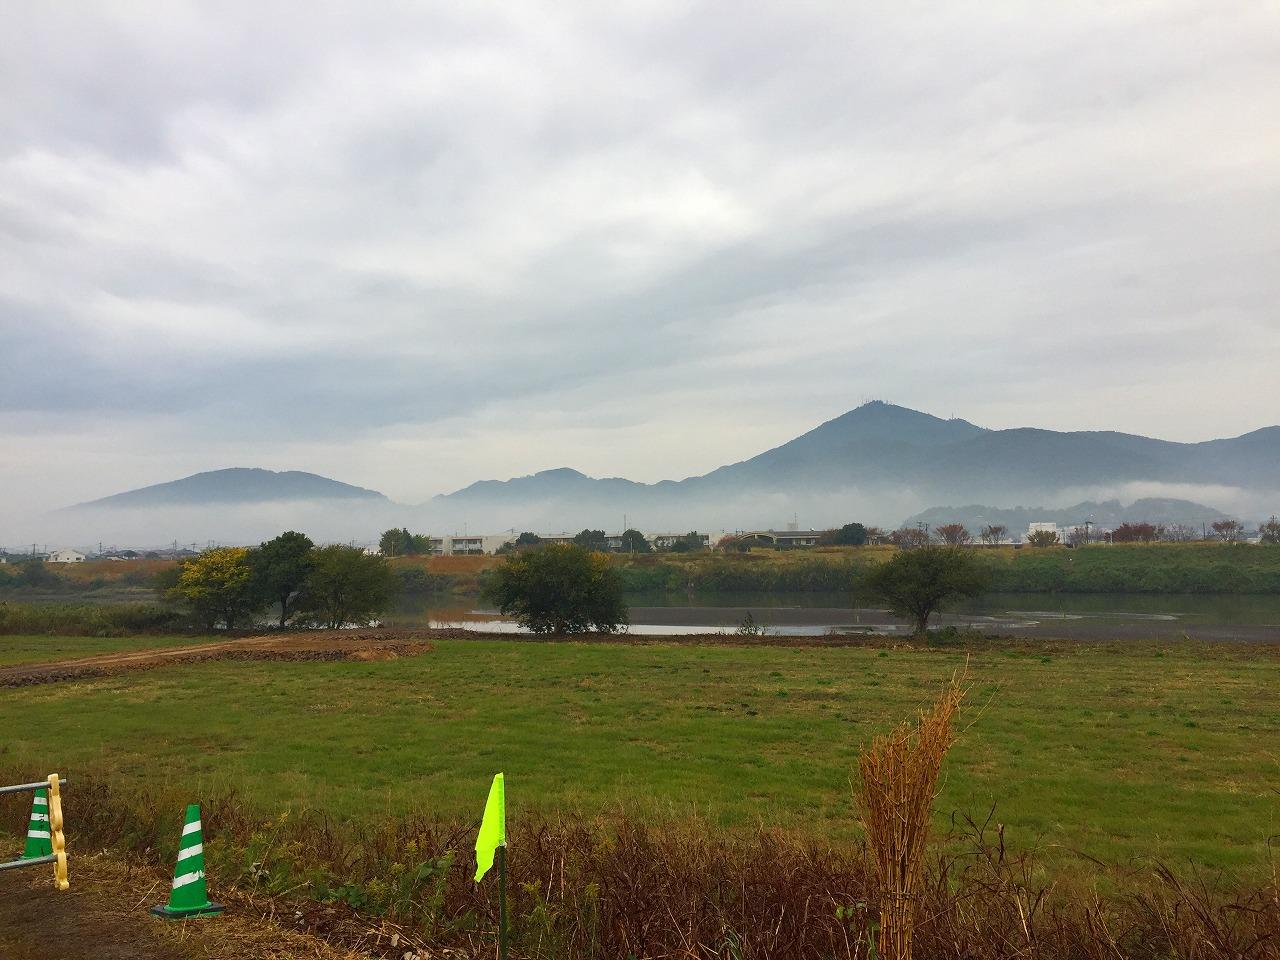 2016.11.14今朝の金峰山